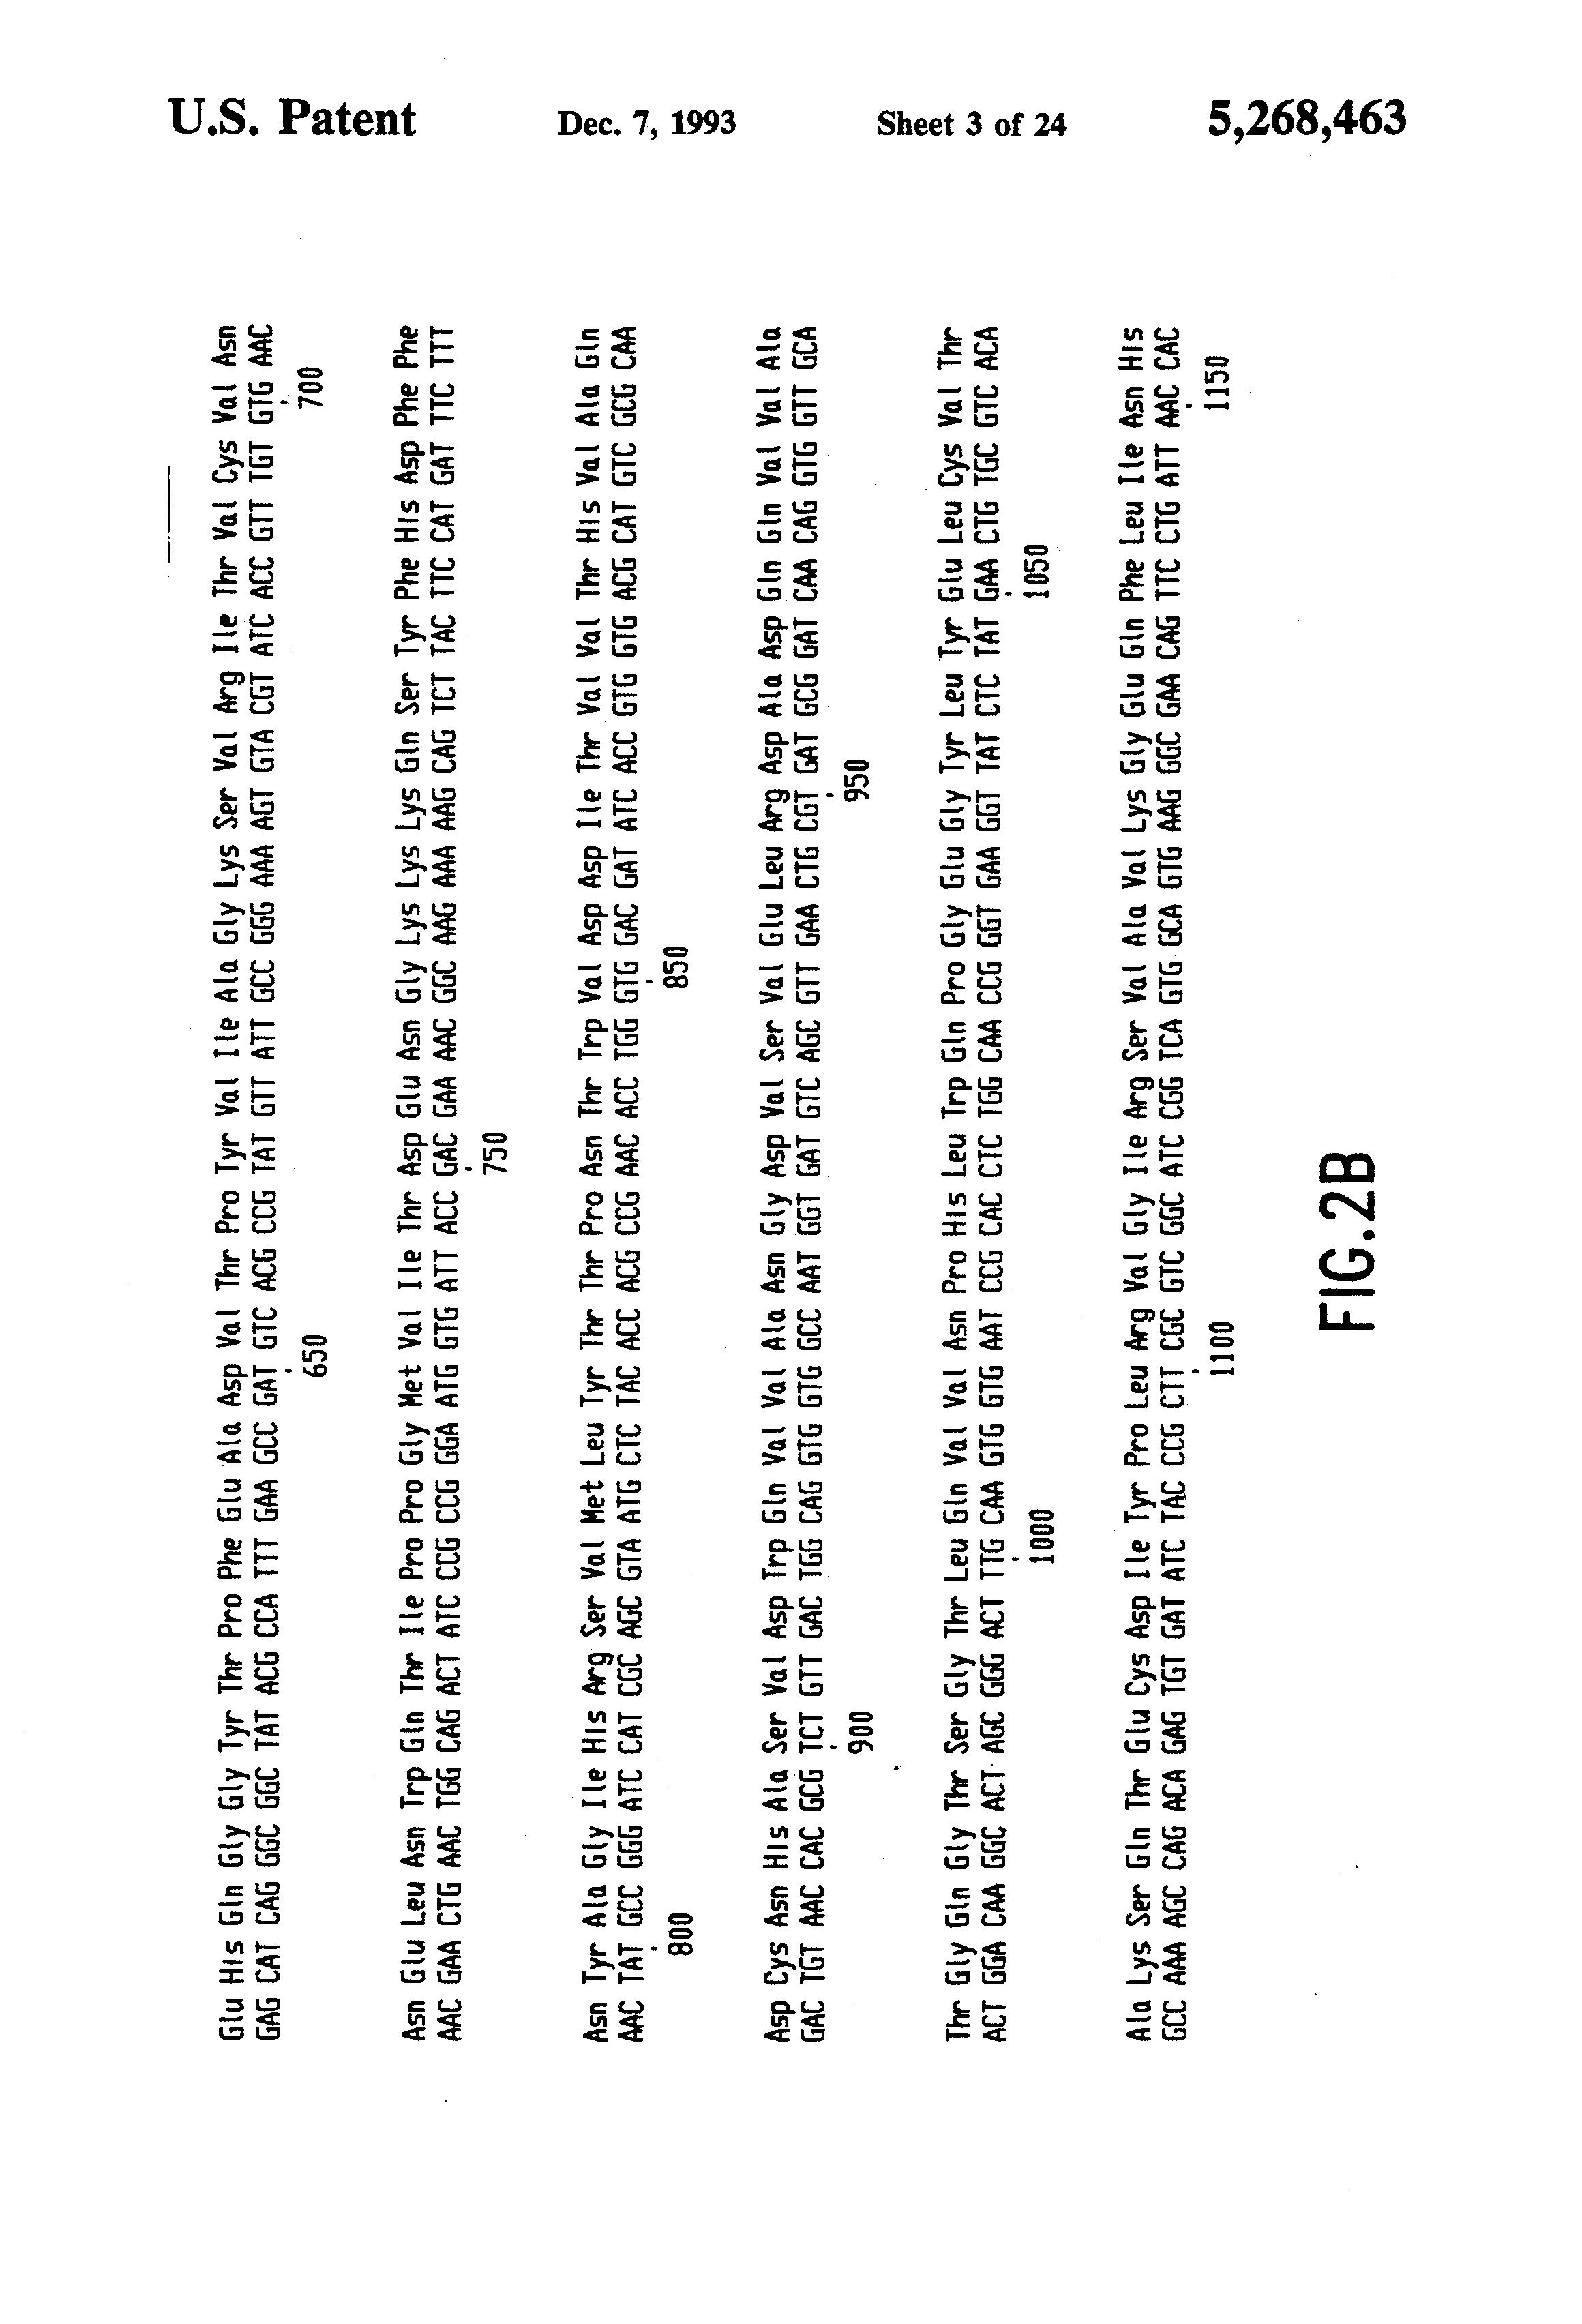 Binary option brokers with 100 minimum deposit etrade